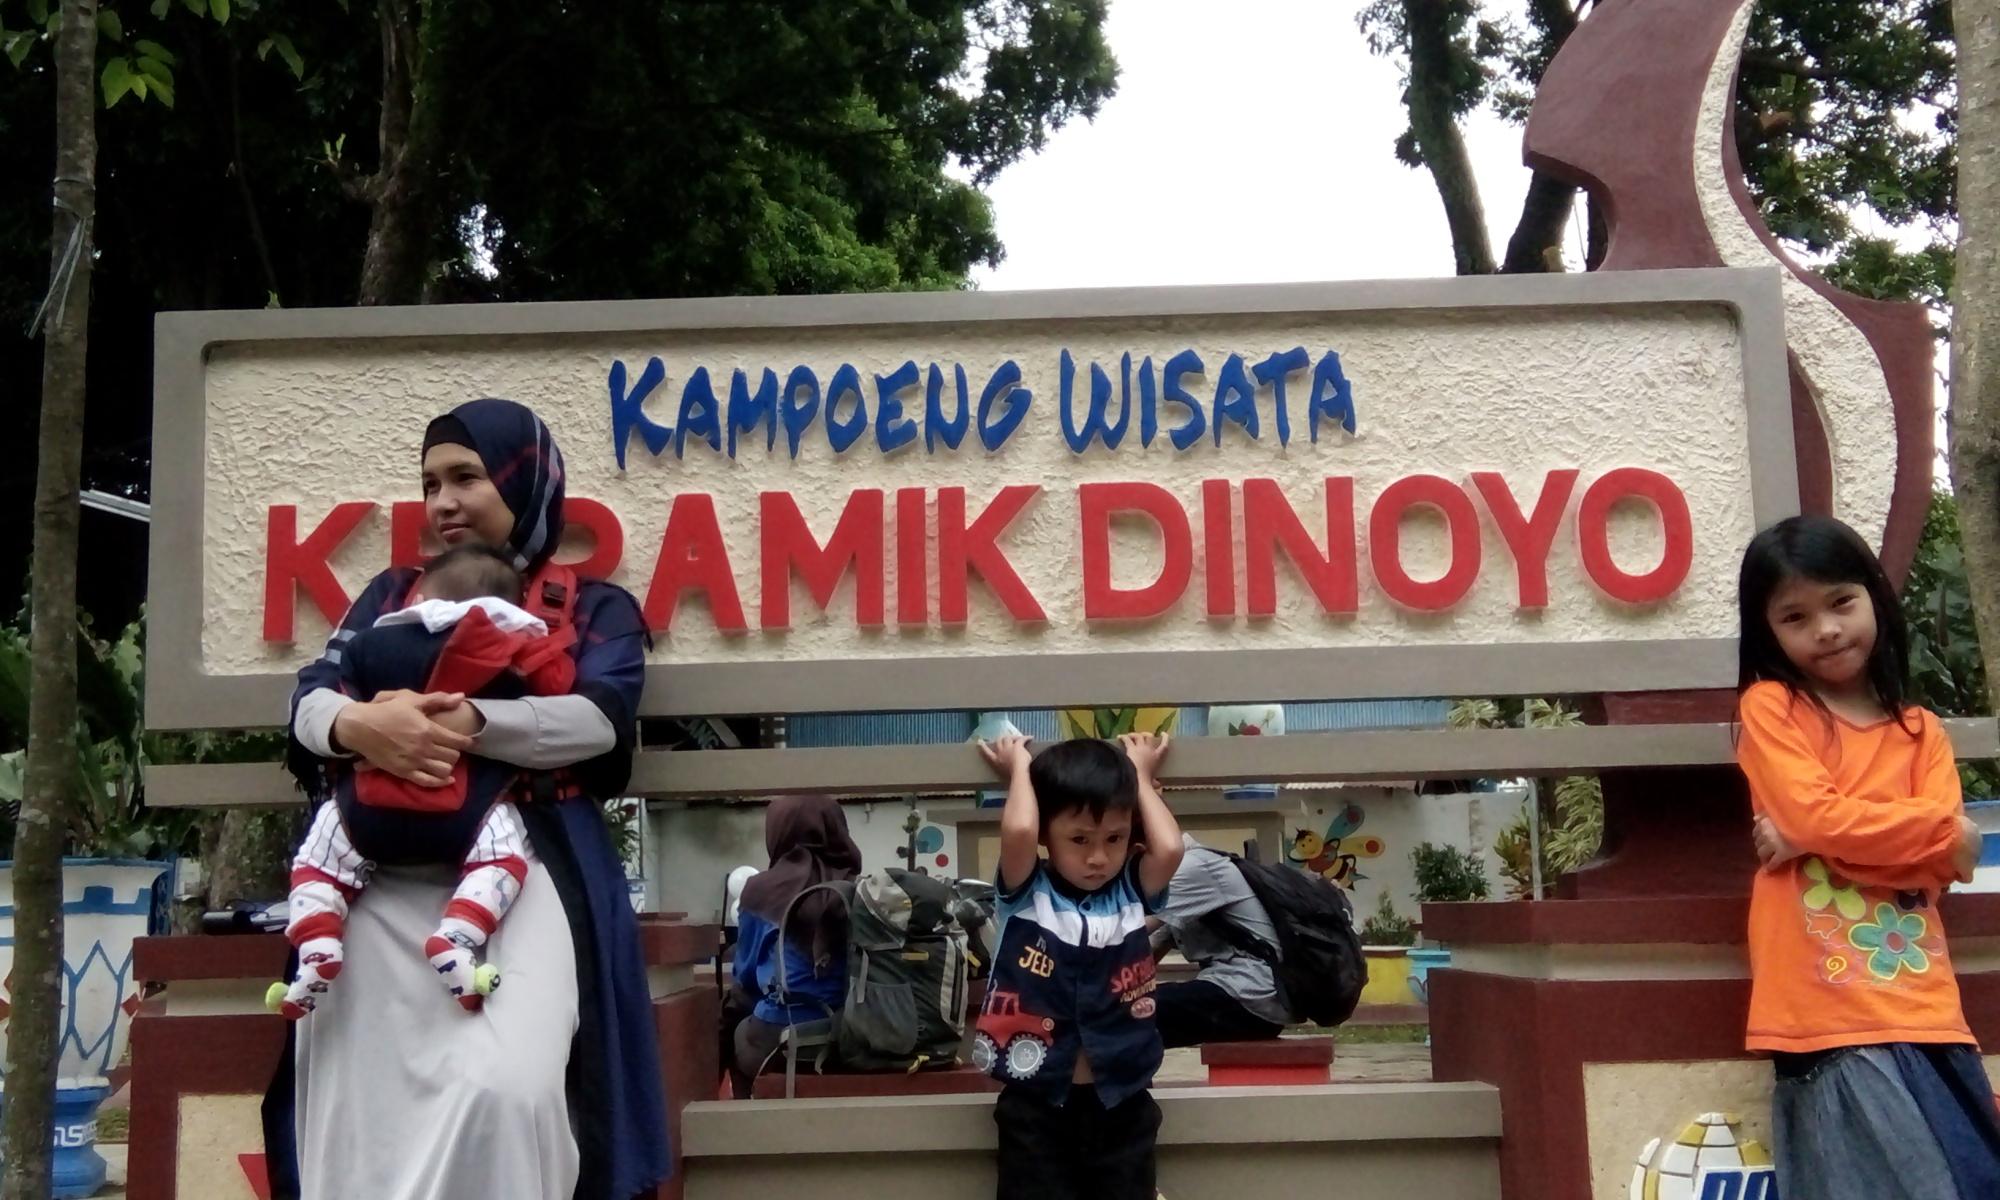 Kampung Keramik Dinoyo Tentang Kita Berbicara Soal Kota Malang Teringat